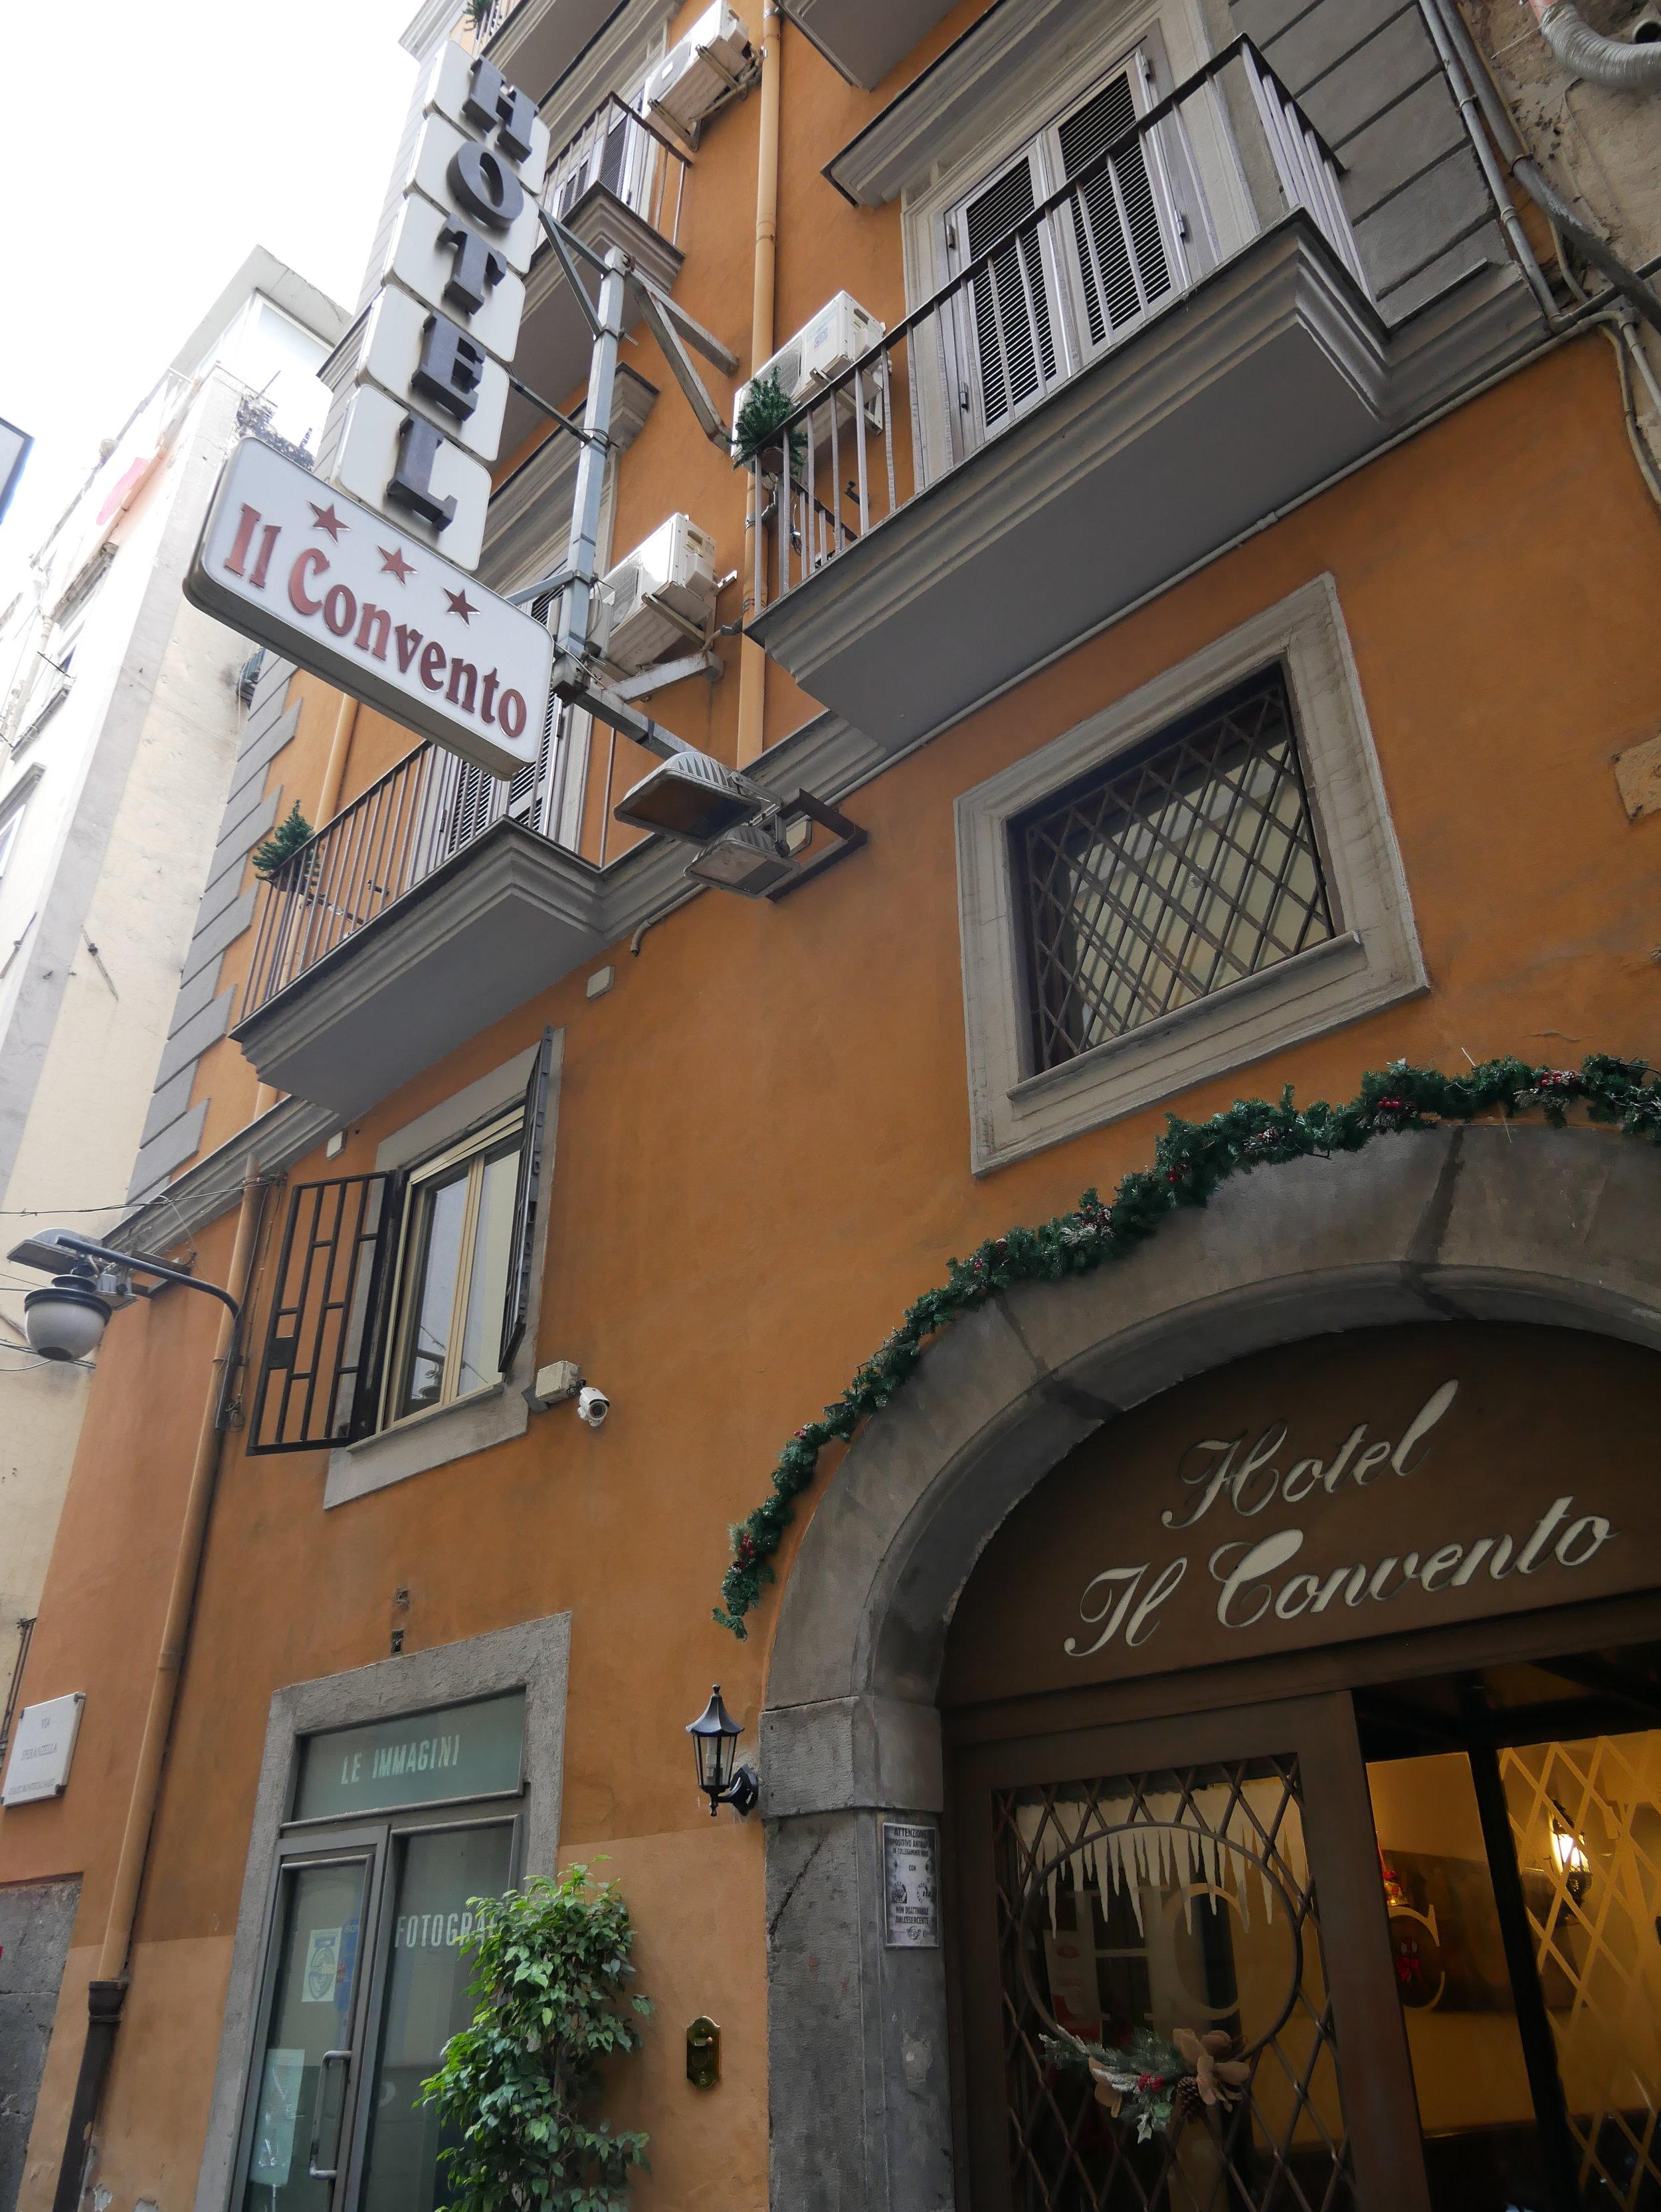 Hotel Il Convento Naples exterior.jpg